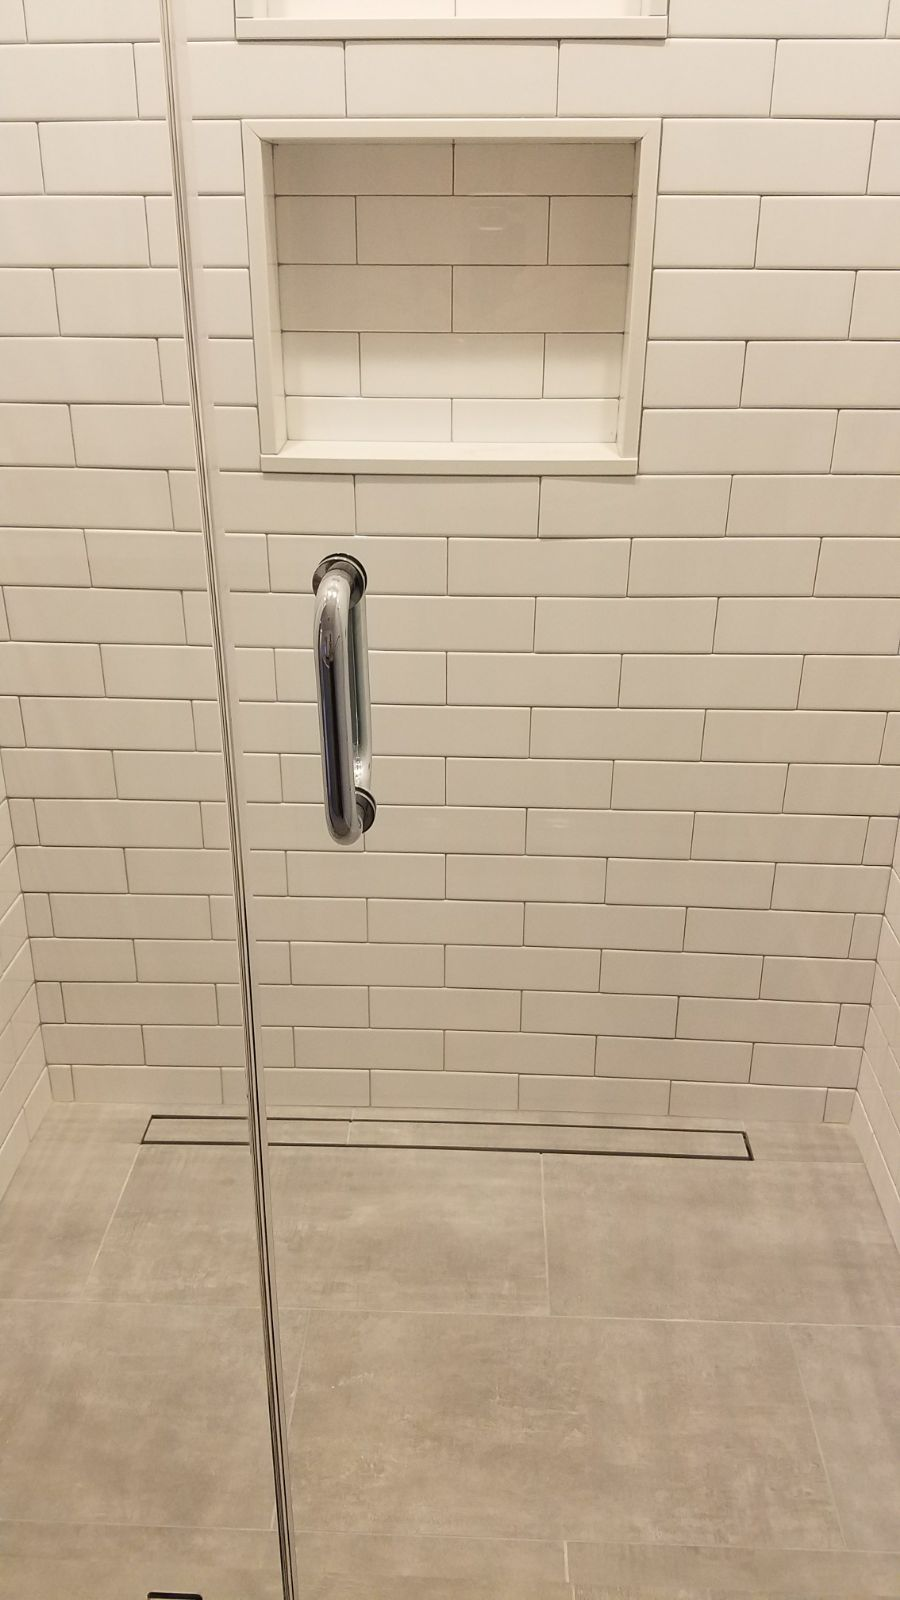 Bathroom 8.36.07 PM (3).jpeg